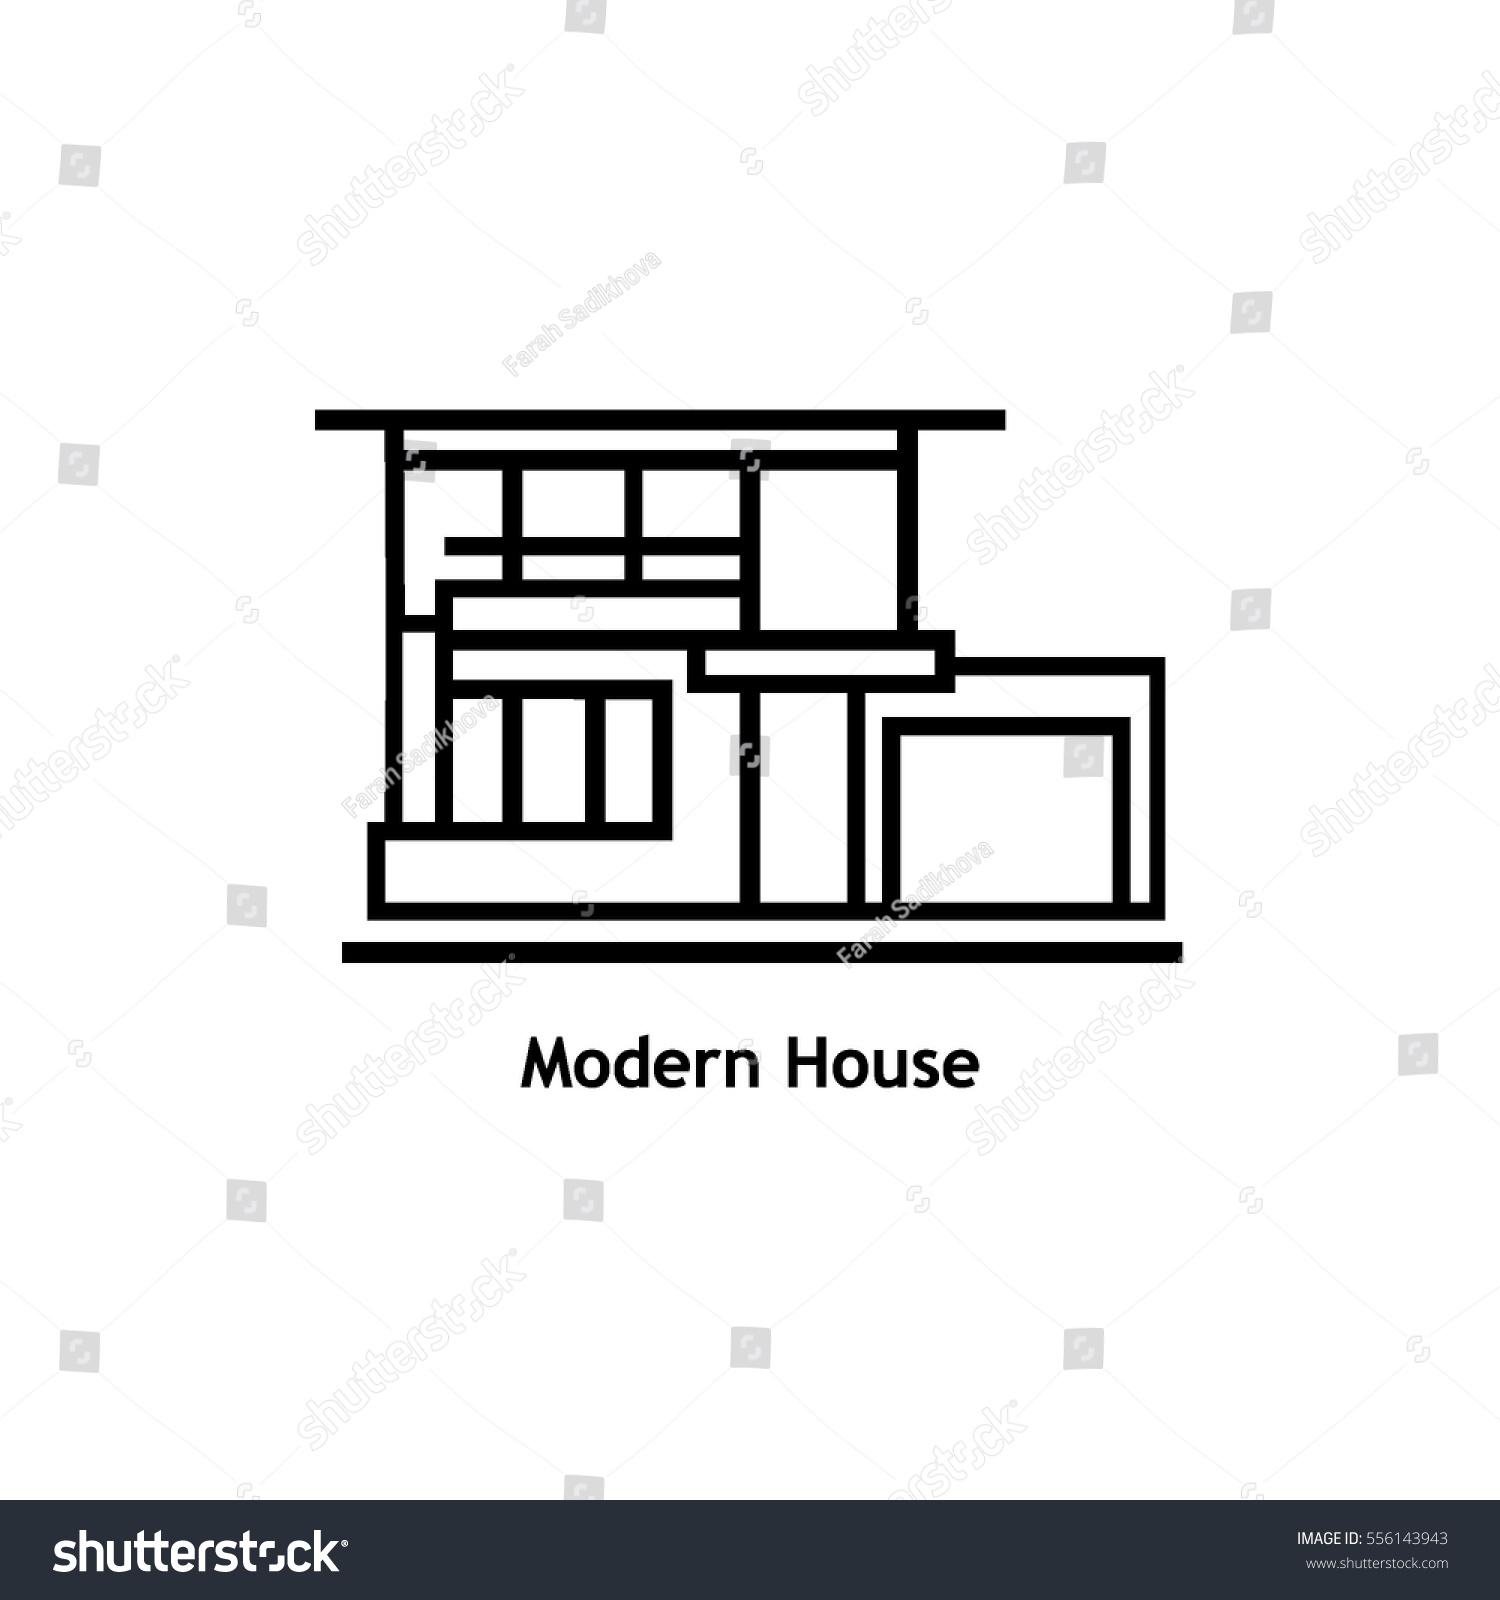 Modern house mansion residence line illustration stock for Modern house real estate